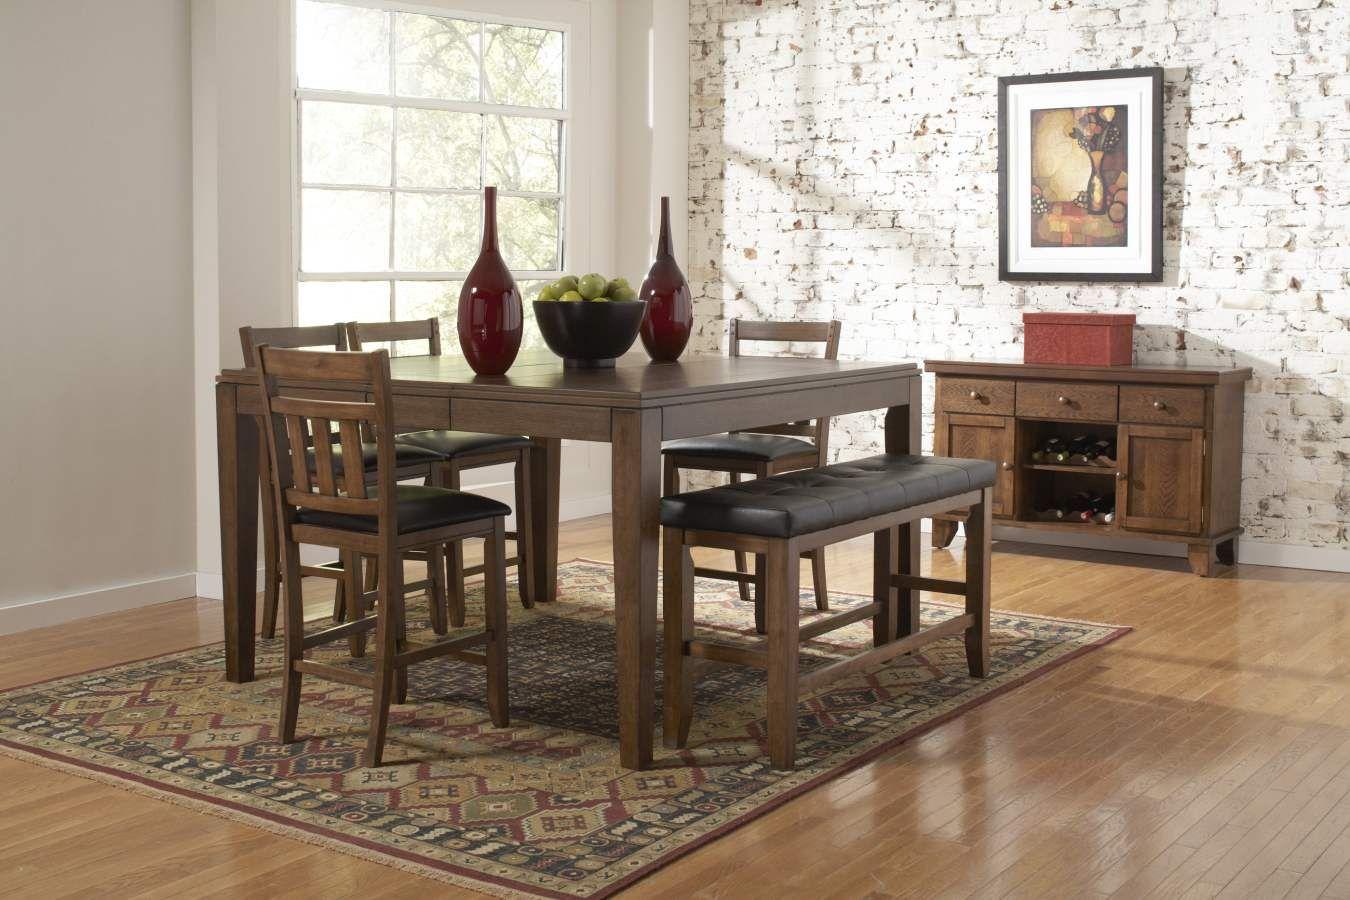 Kirtland Warm Oak Counter Height Bench Home Elegance